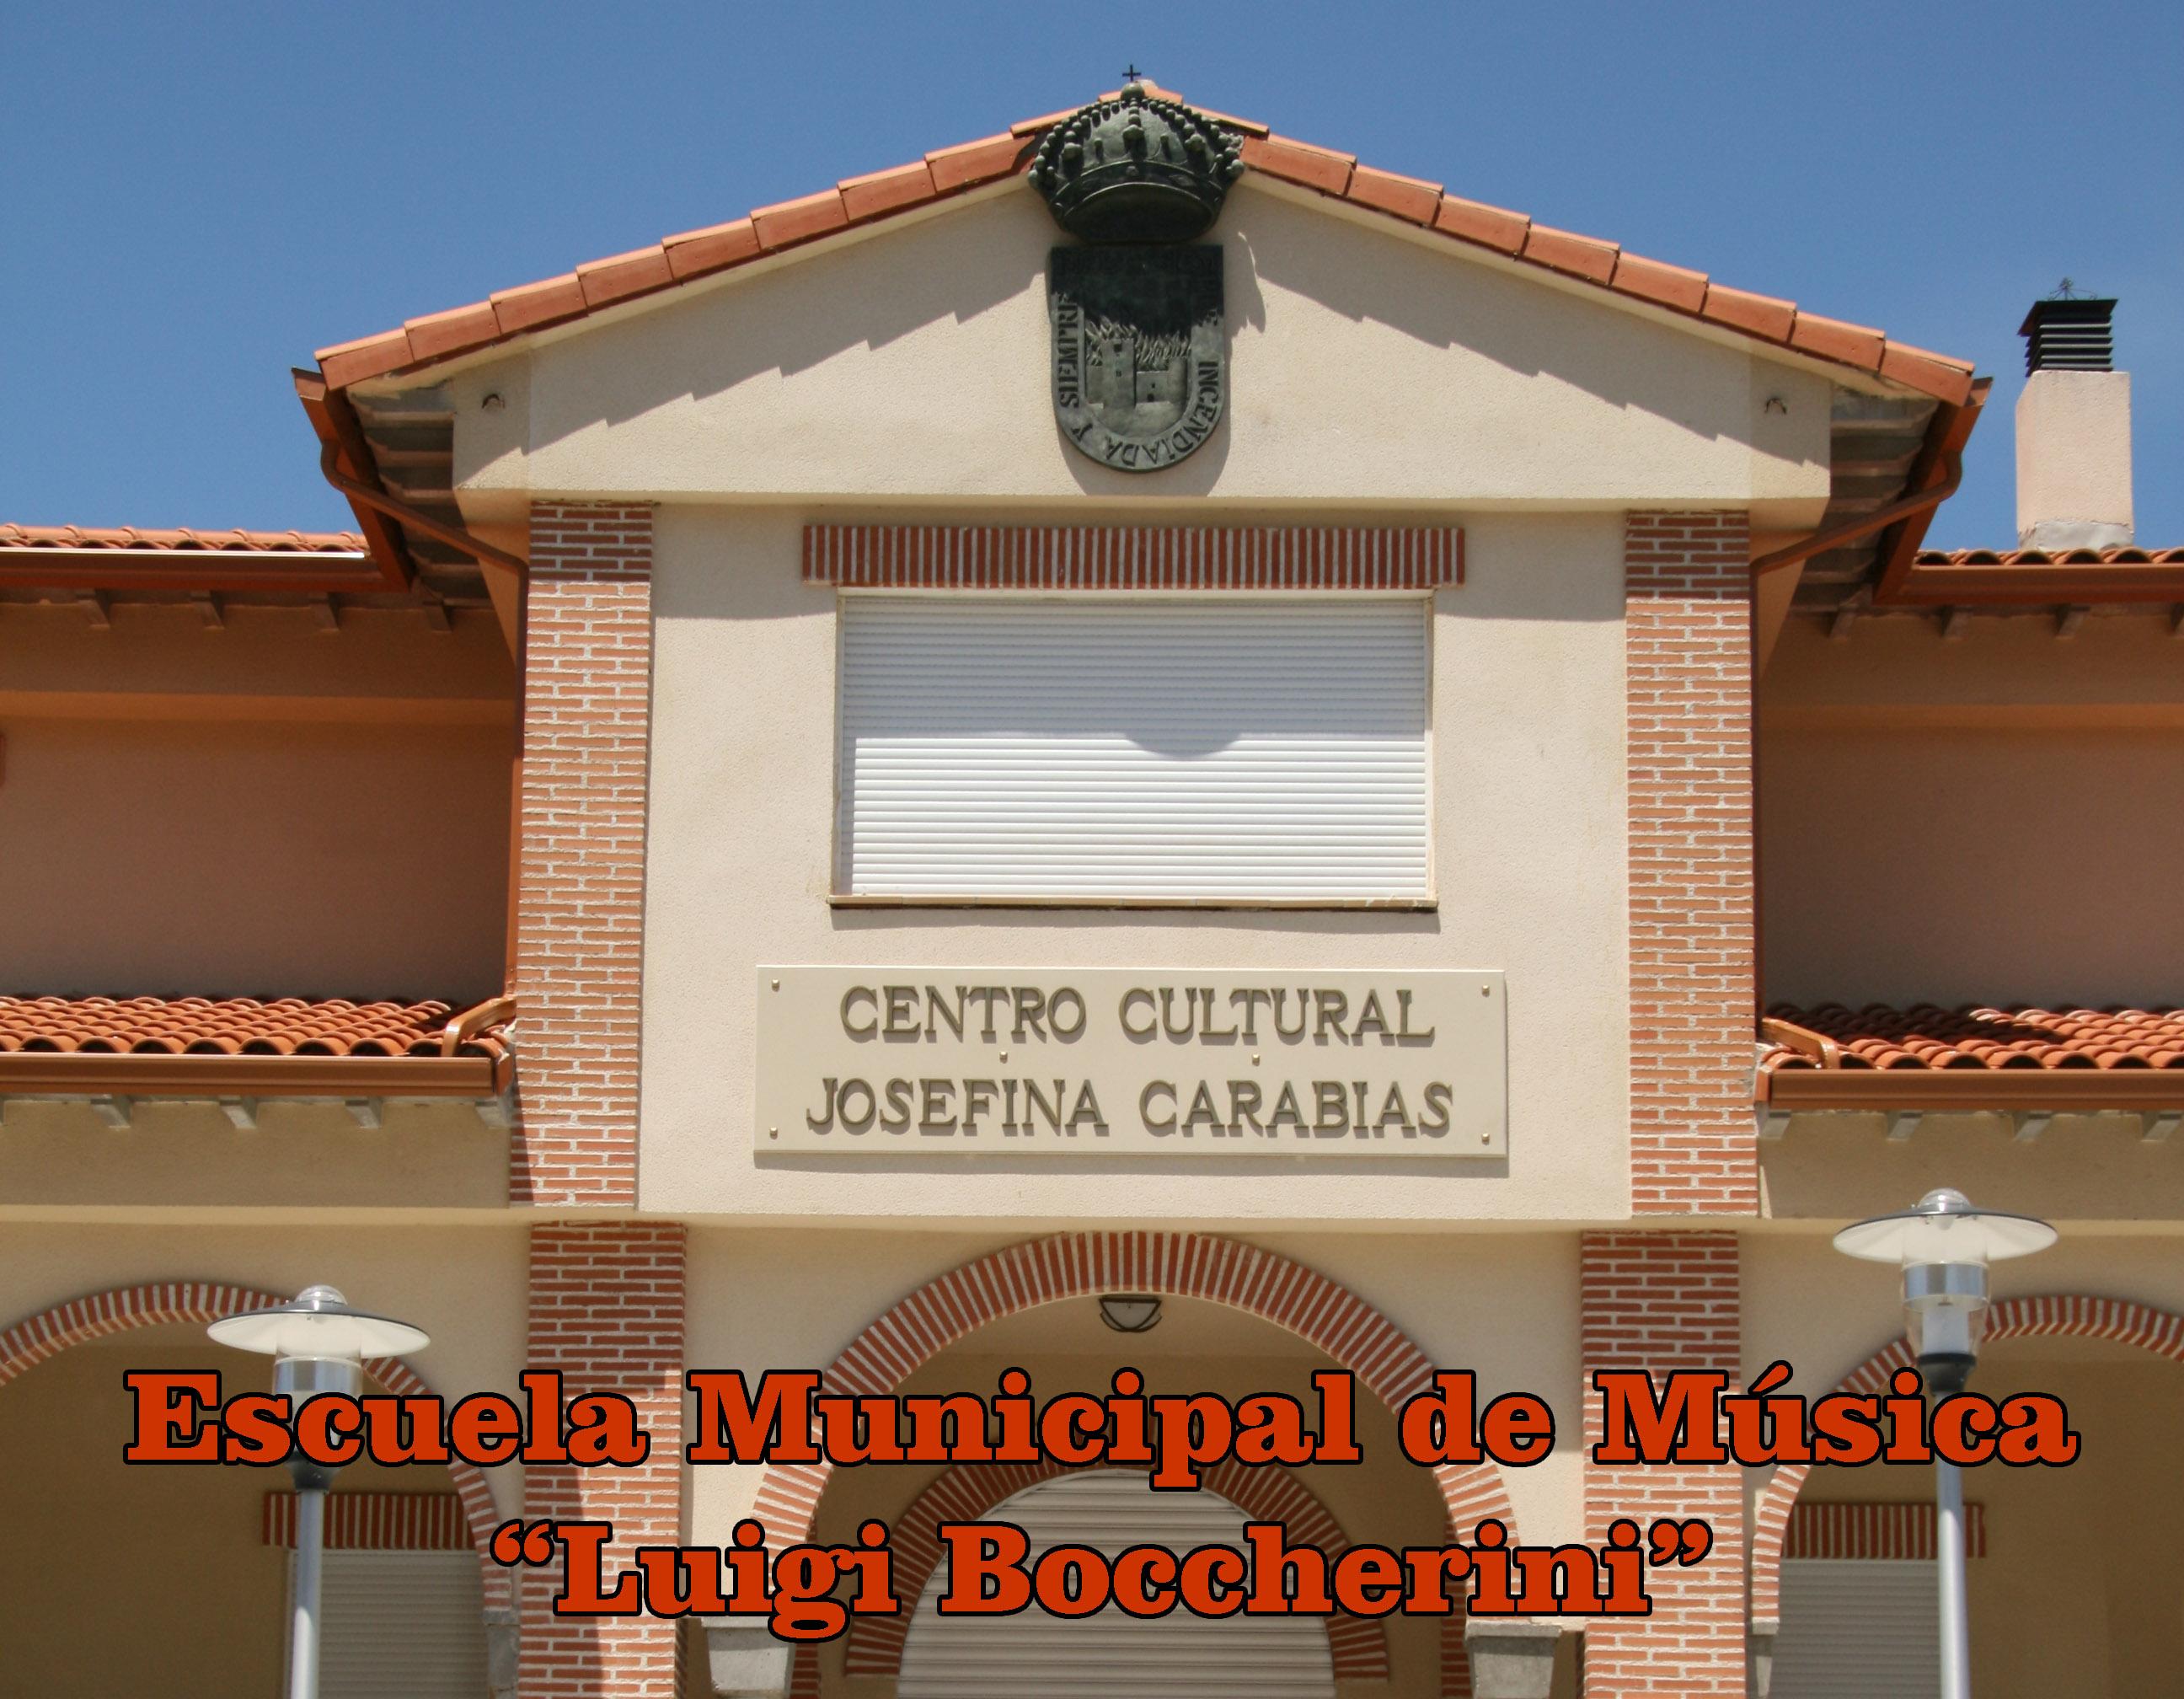 Escuela de Música Luigi Boccherini